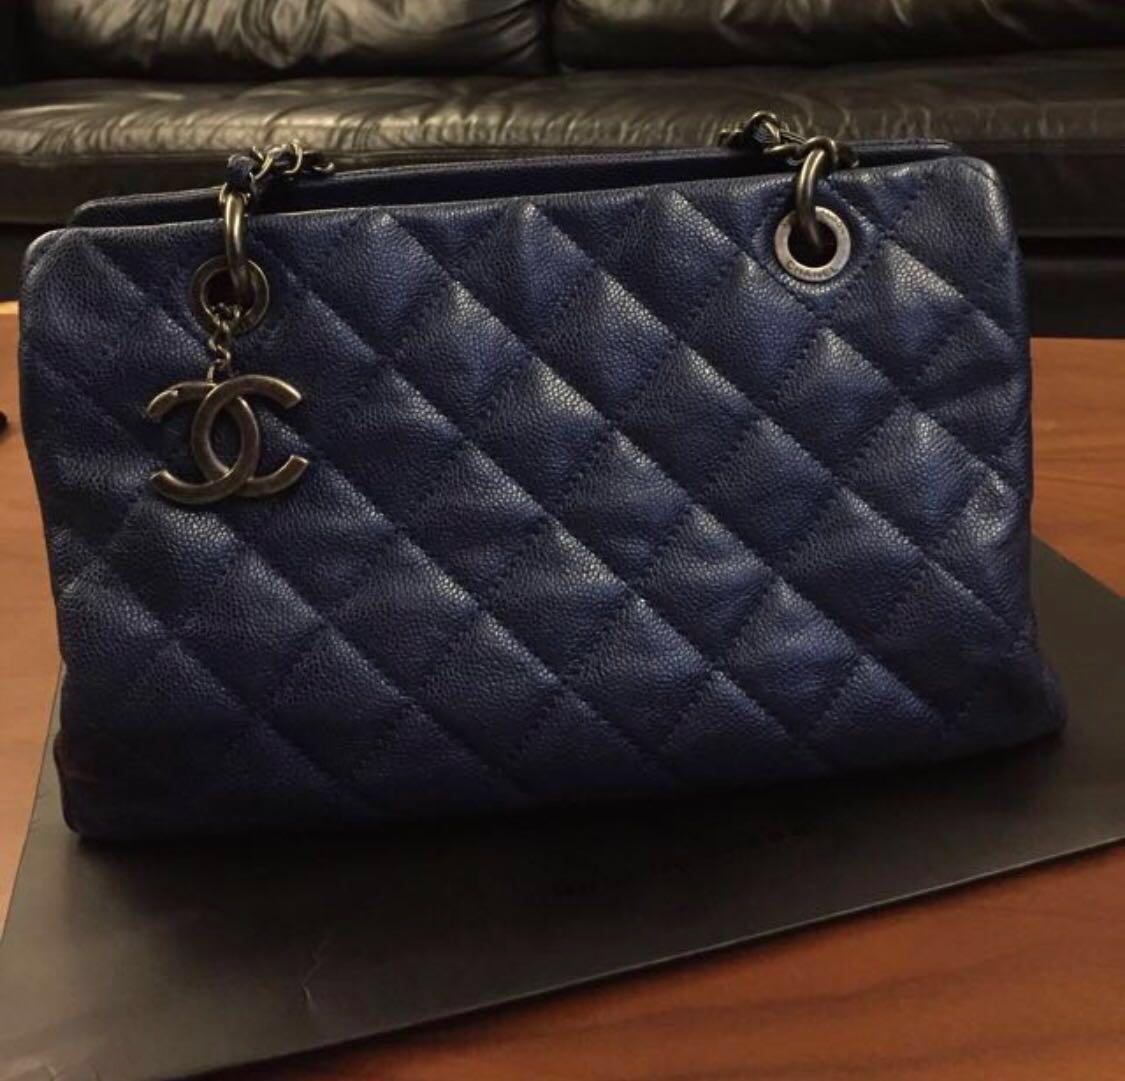 e8d66b55ae2175 Chanel Tote Bag, Luxury, Bags & Wallets, Handbags on Carousell